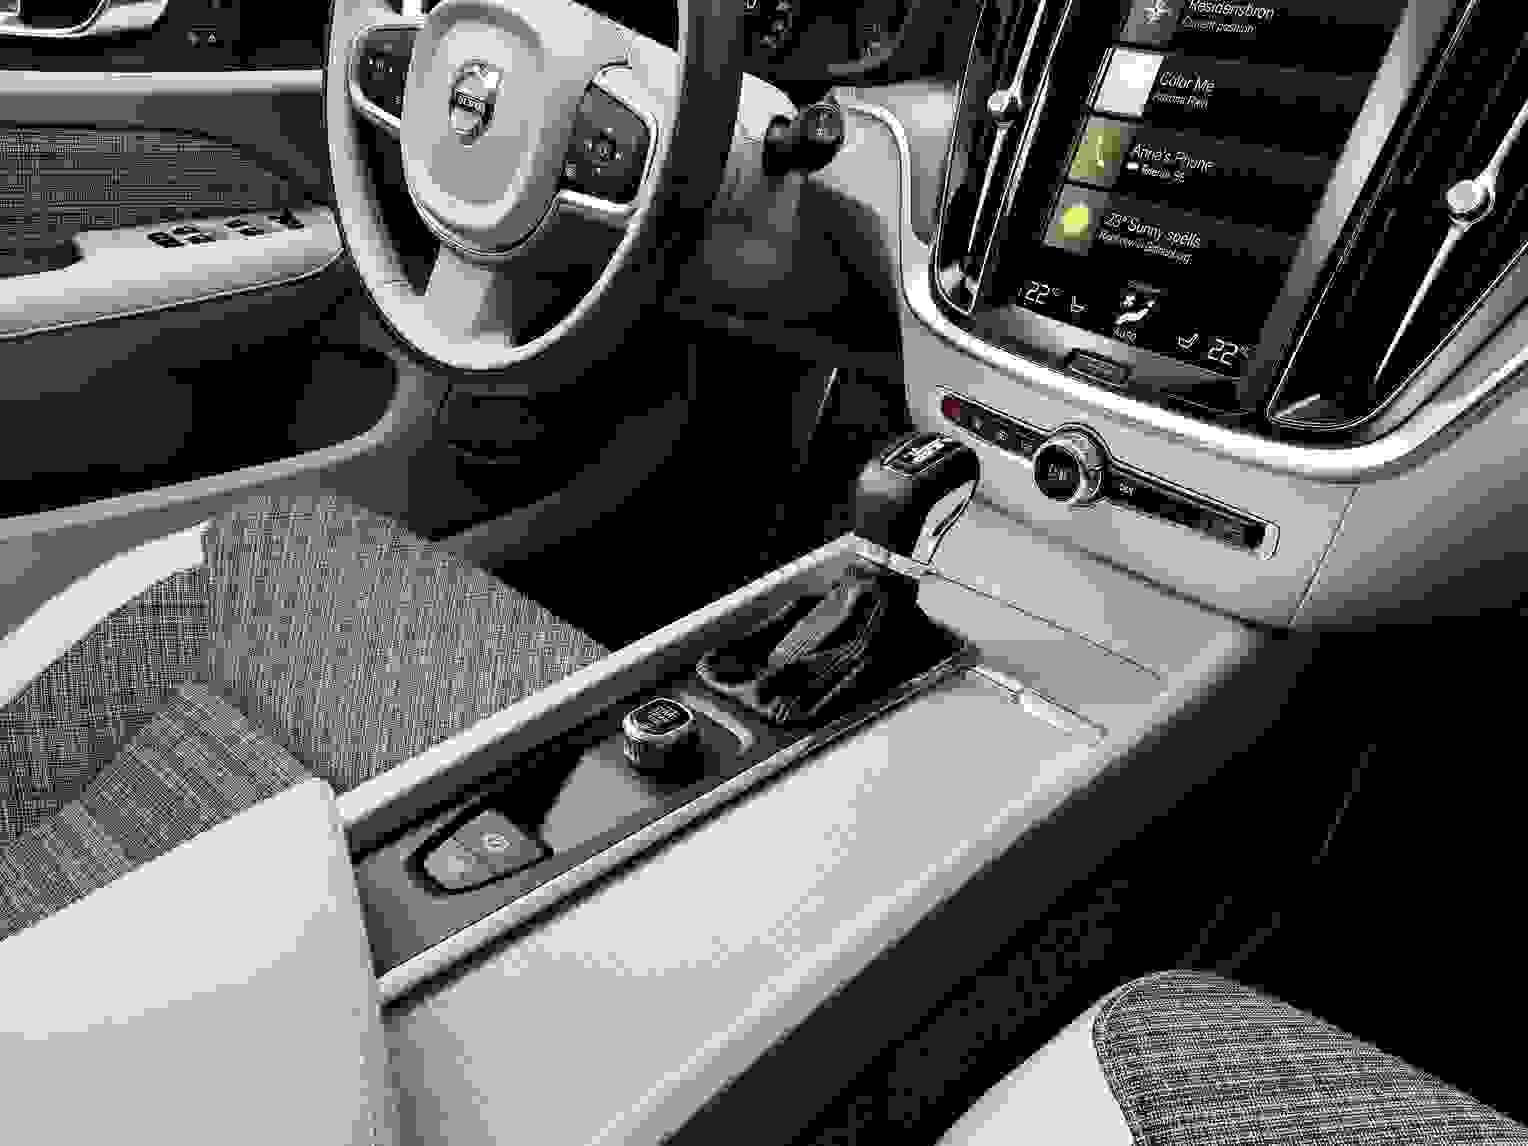 Volvo V60 Stationcar Gearvaelger Midterkonsol Luksusbil